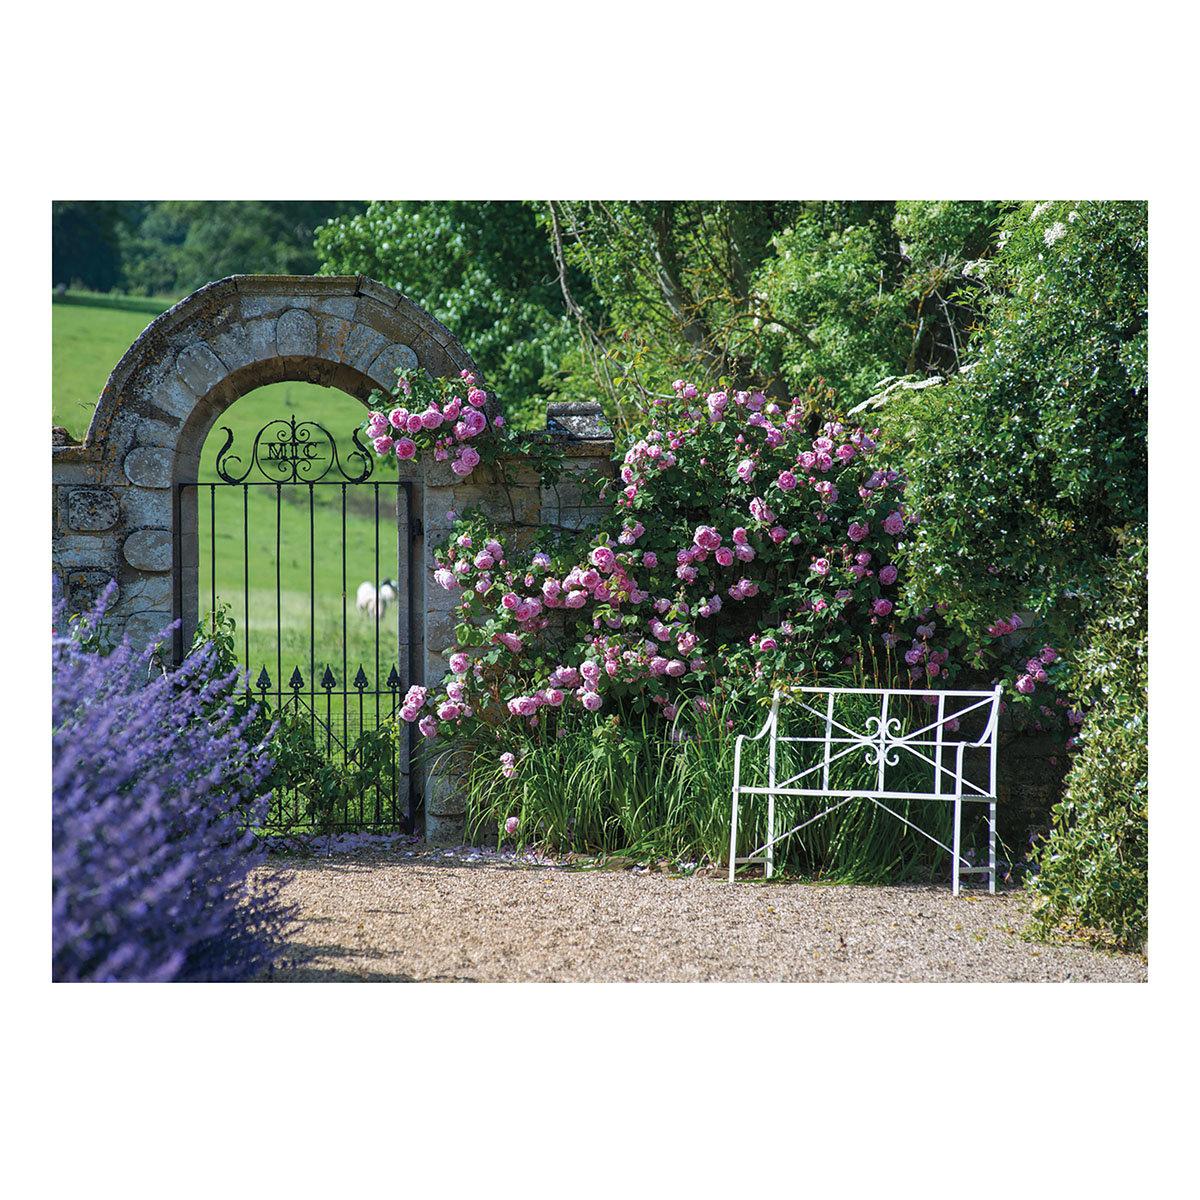 Gartenposter Rosentraum, 210 x 150 cm